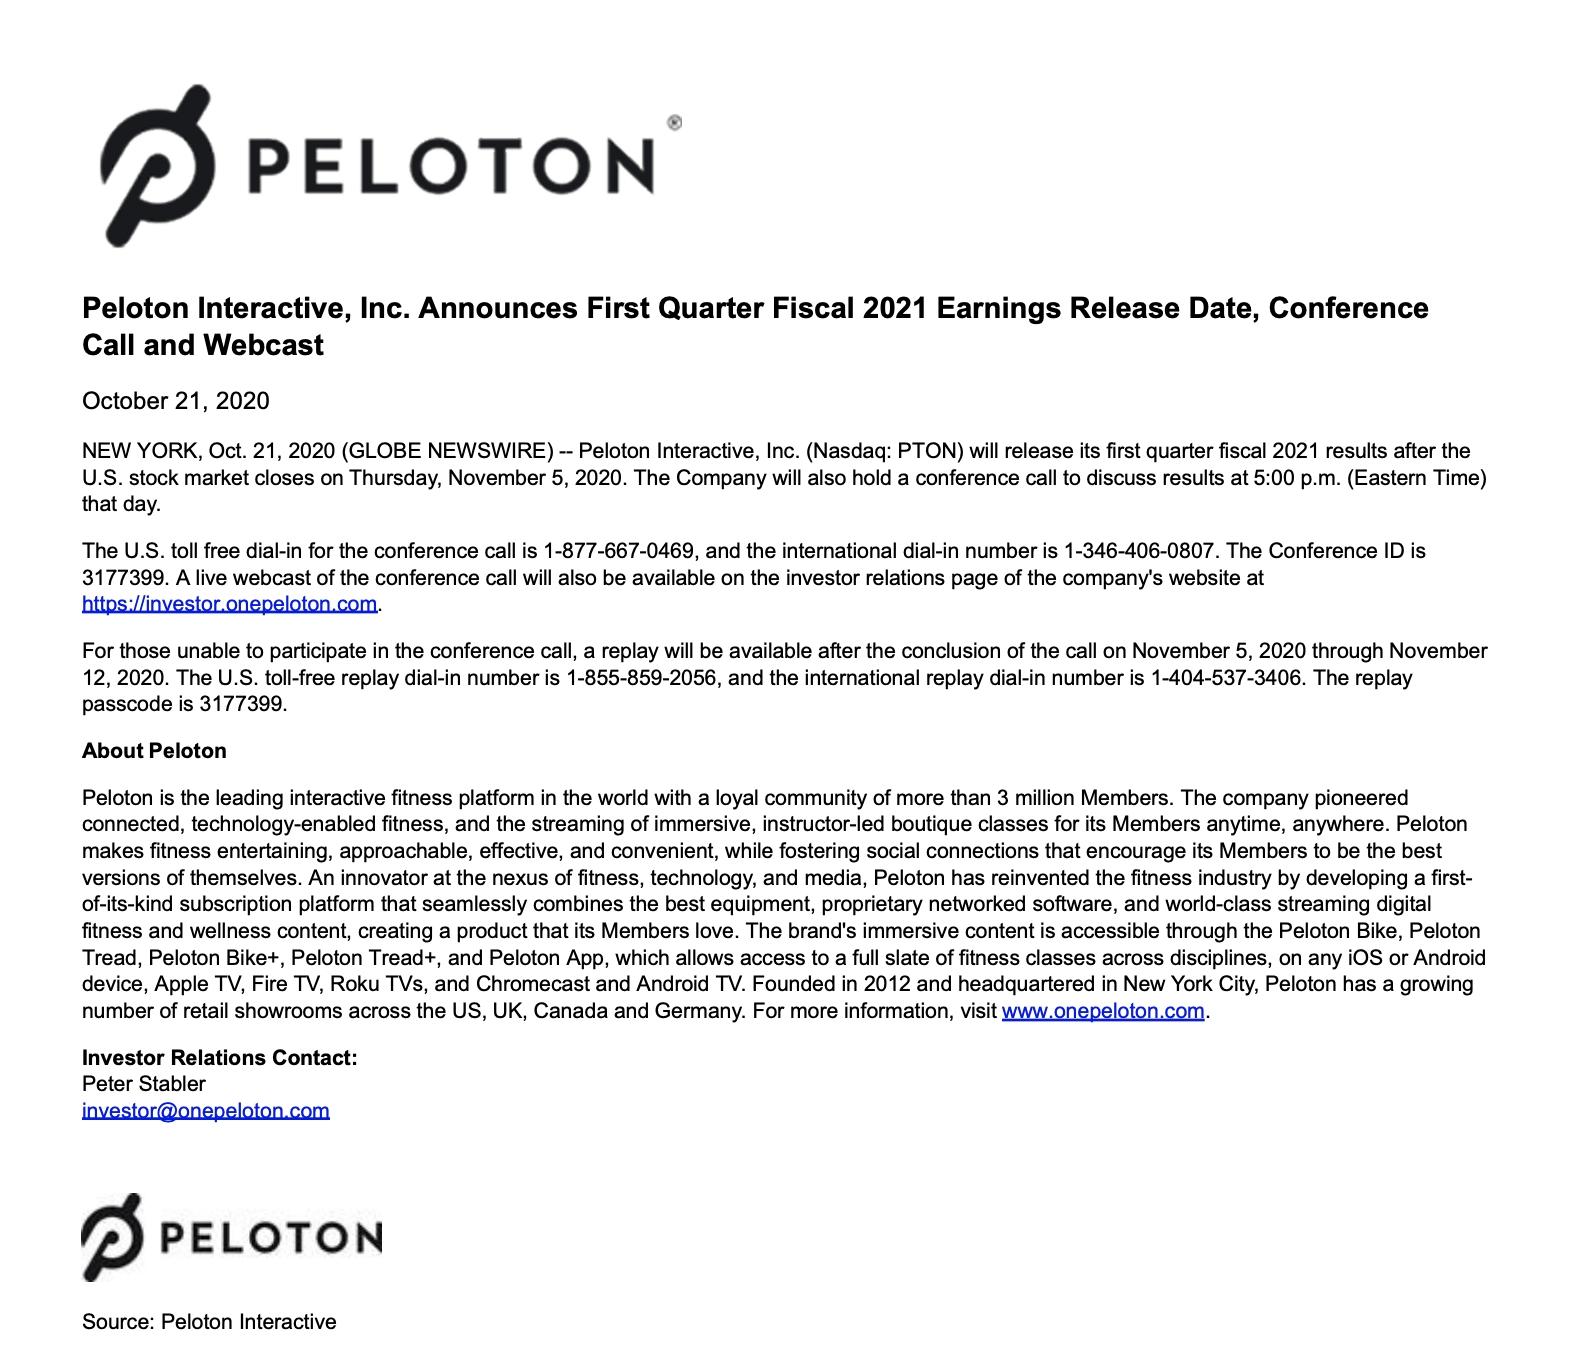 Peloton Q1 2021 Earnings Call Date Announced - Peloton Buddy